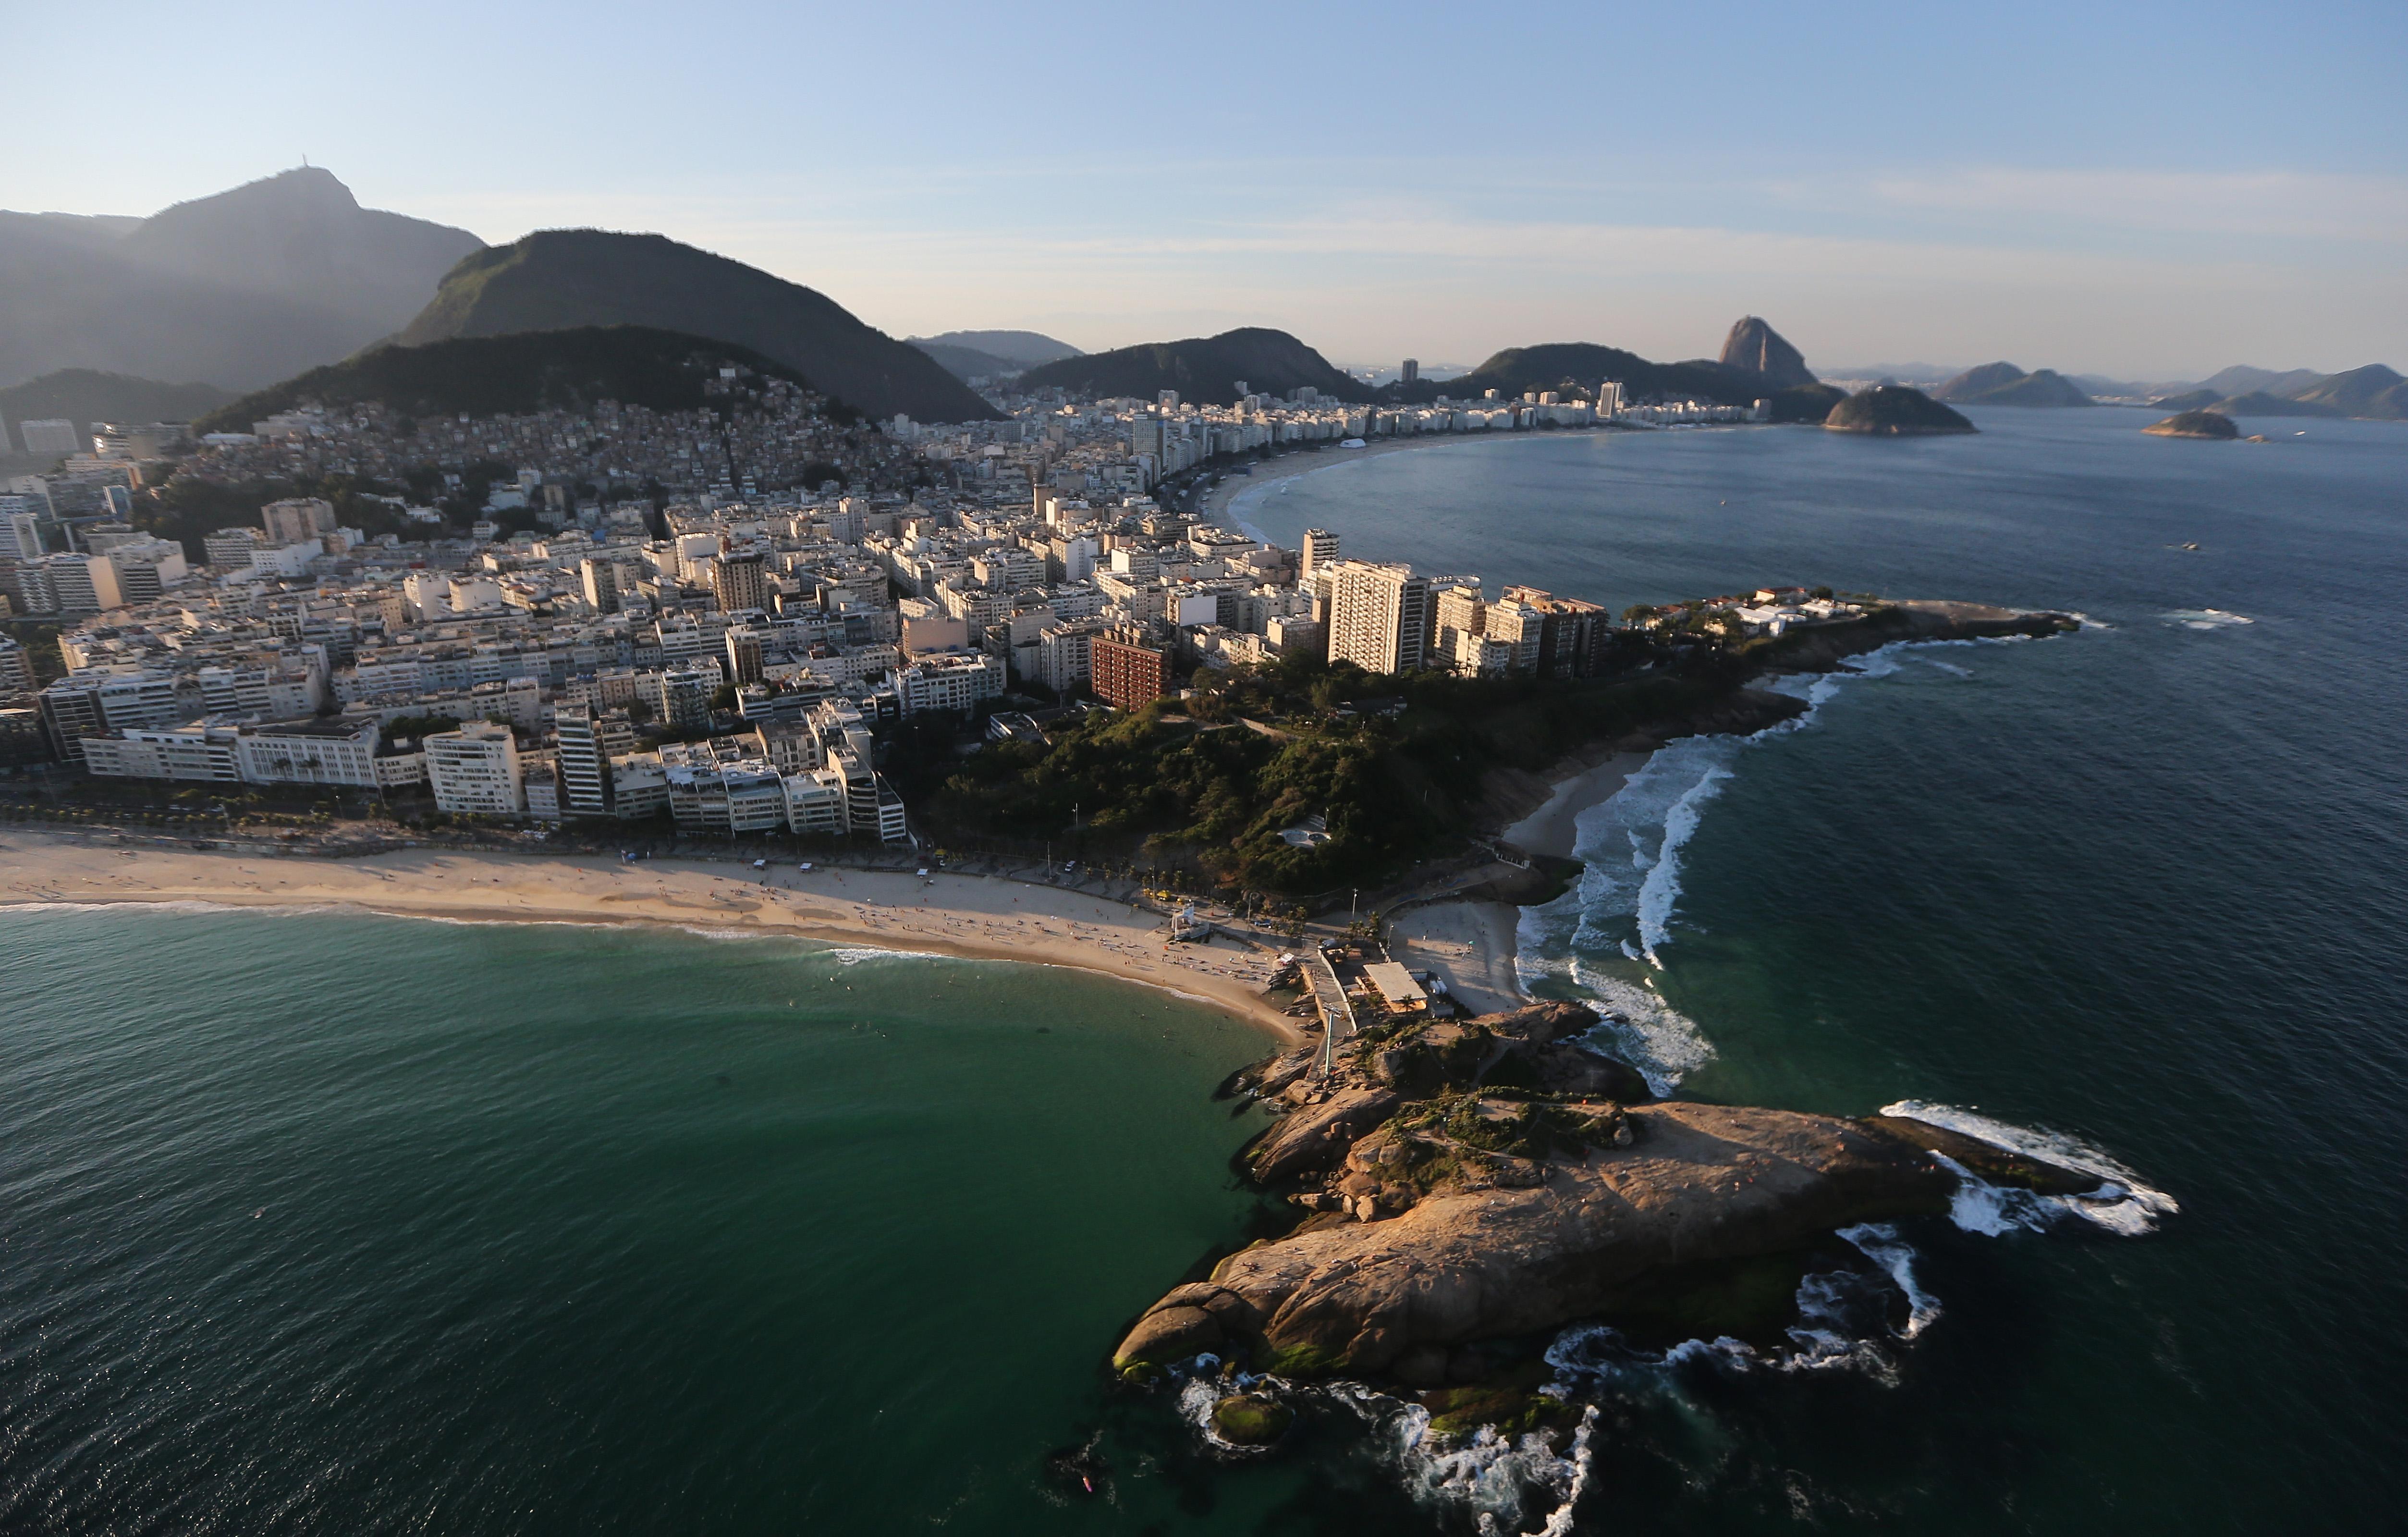 Ipanema beach, Arpoador rock and Copacabana Beach, one of the Olympic venue locations, stand on July 4, 2016 in Rio de Janeiro, Brazil.